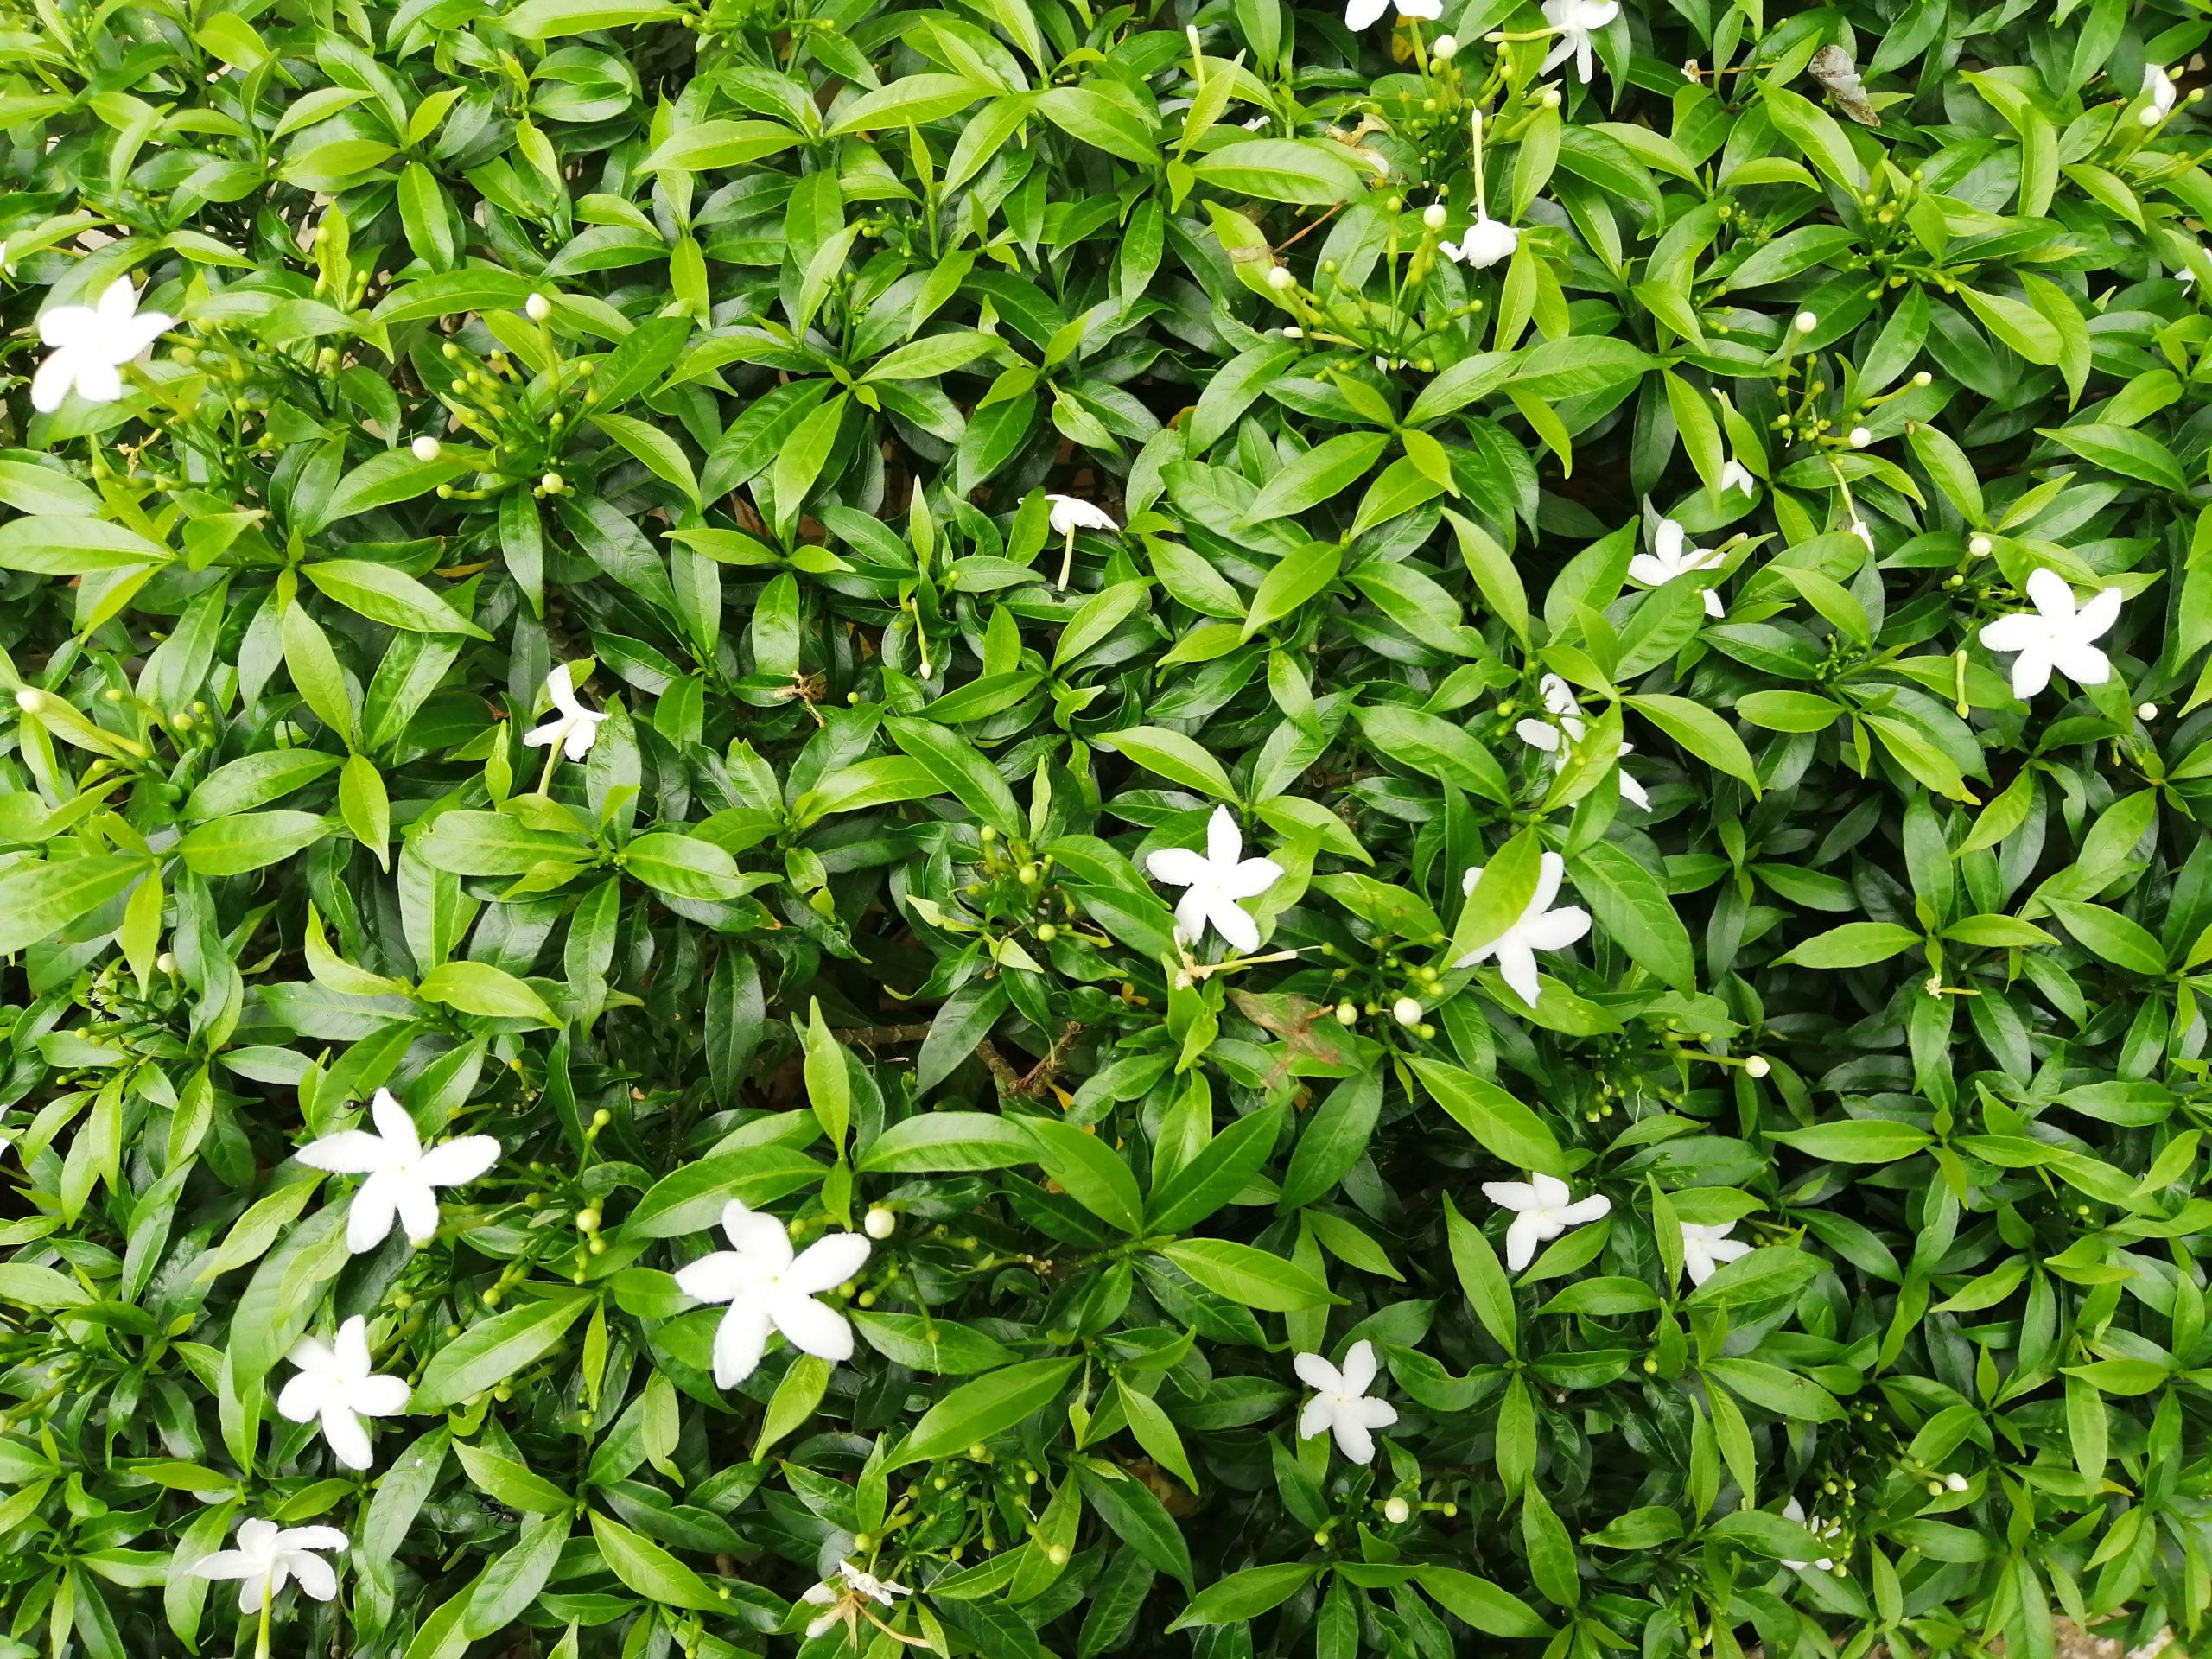 Green shrub natural background